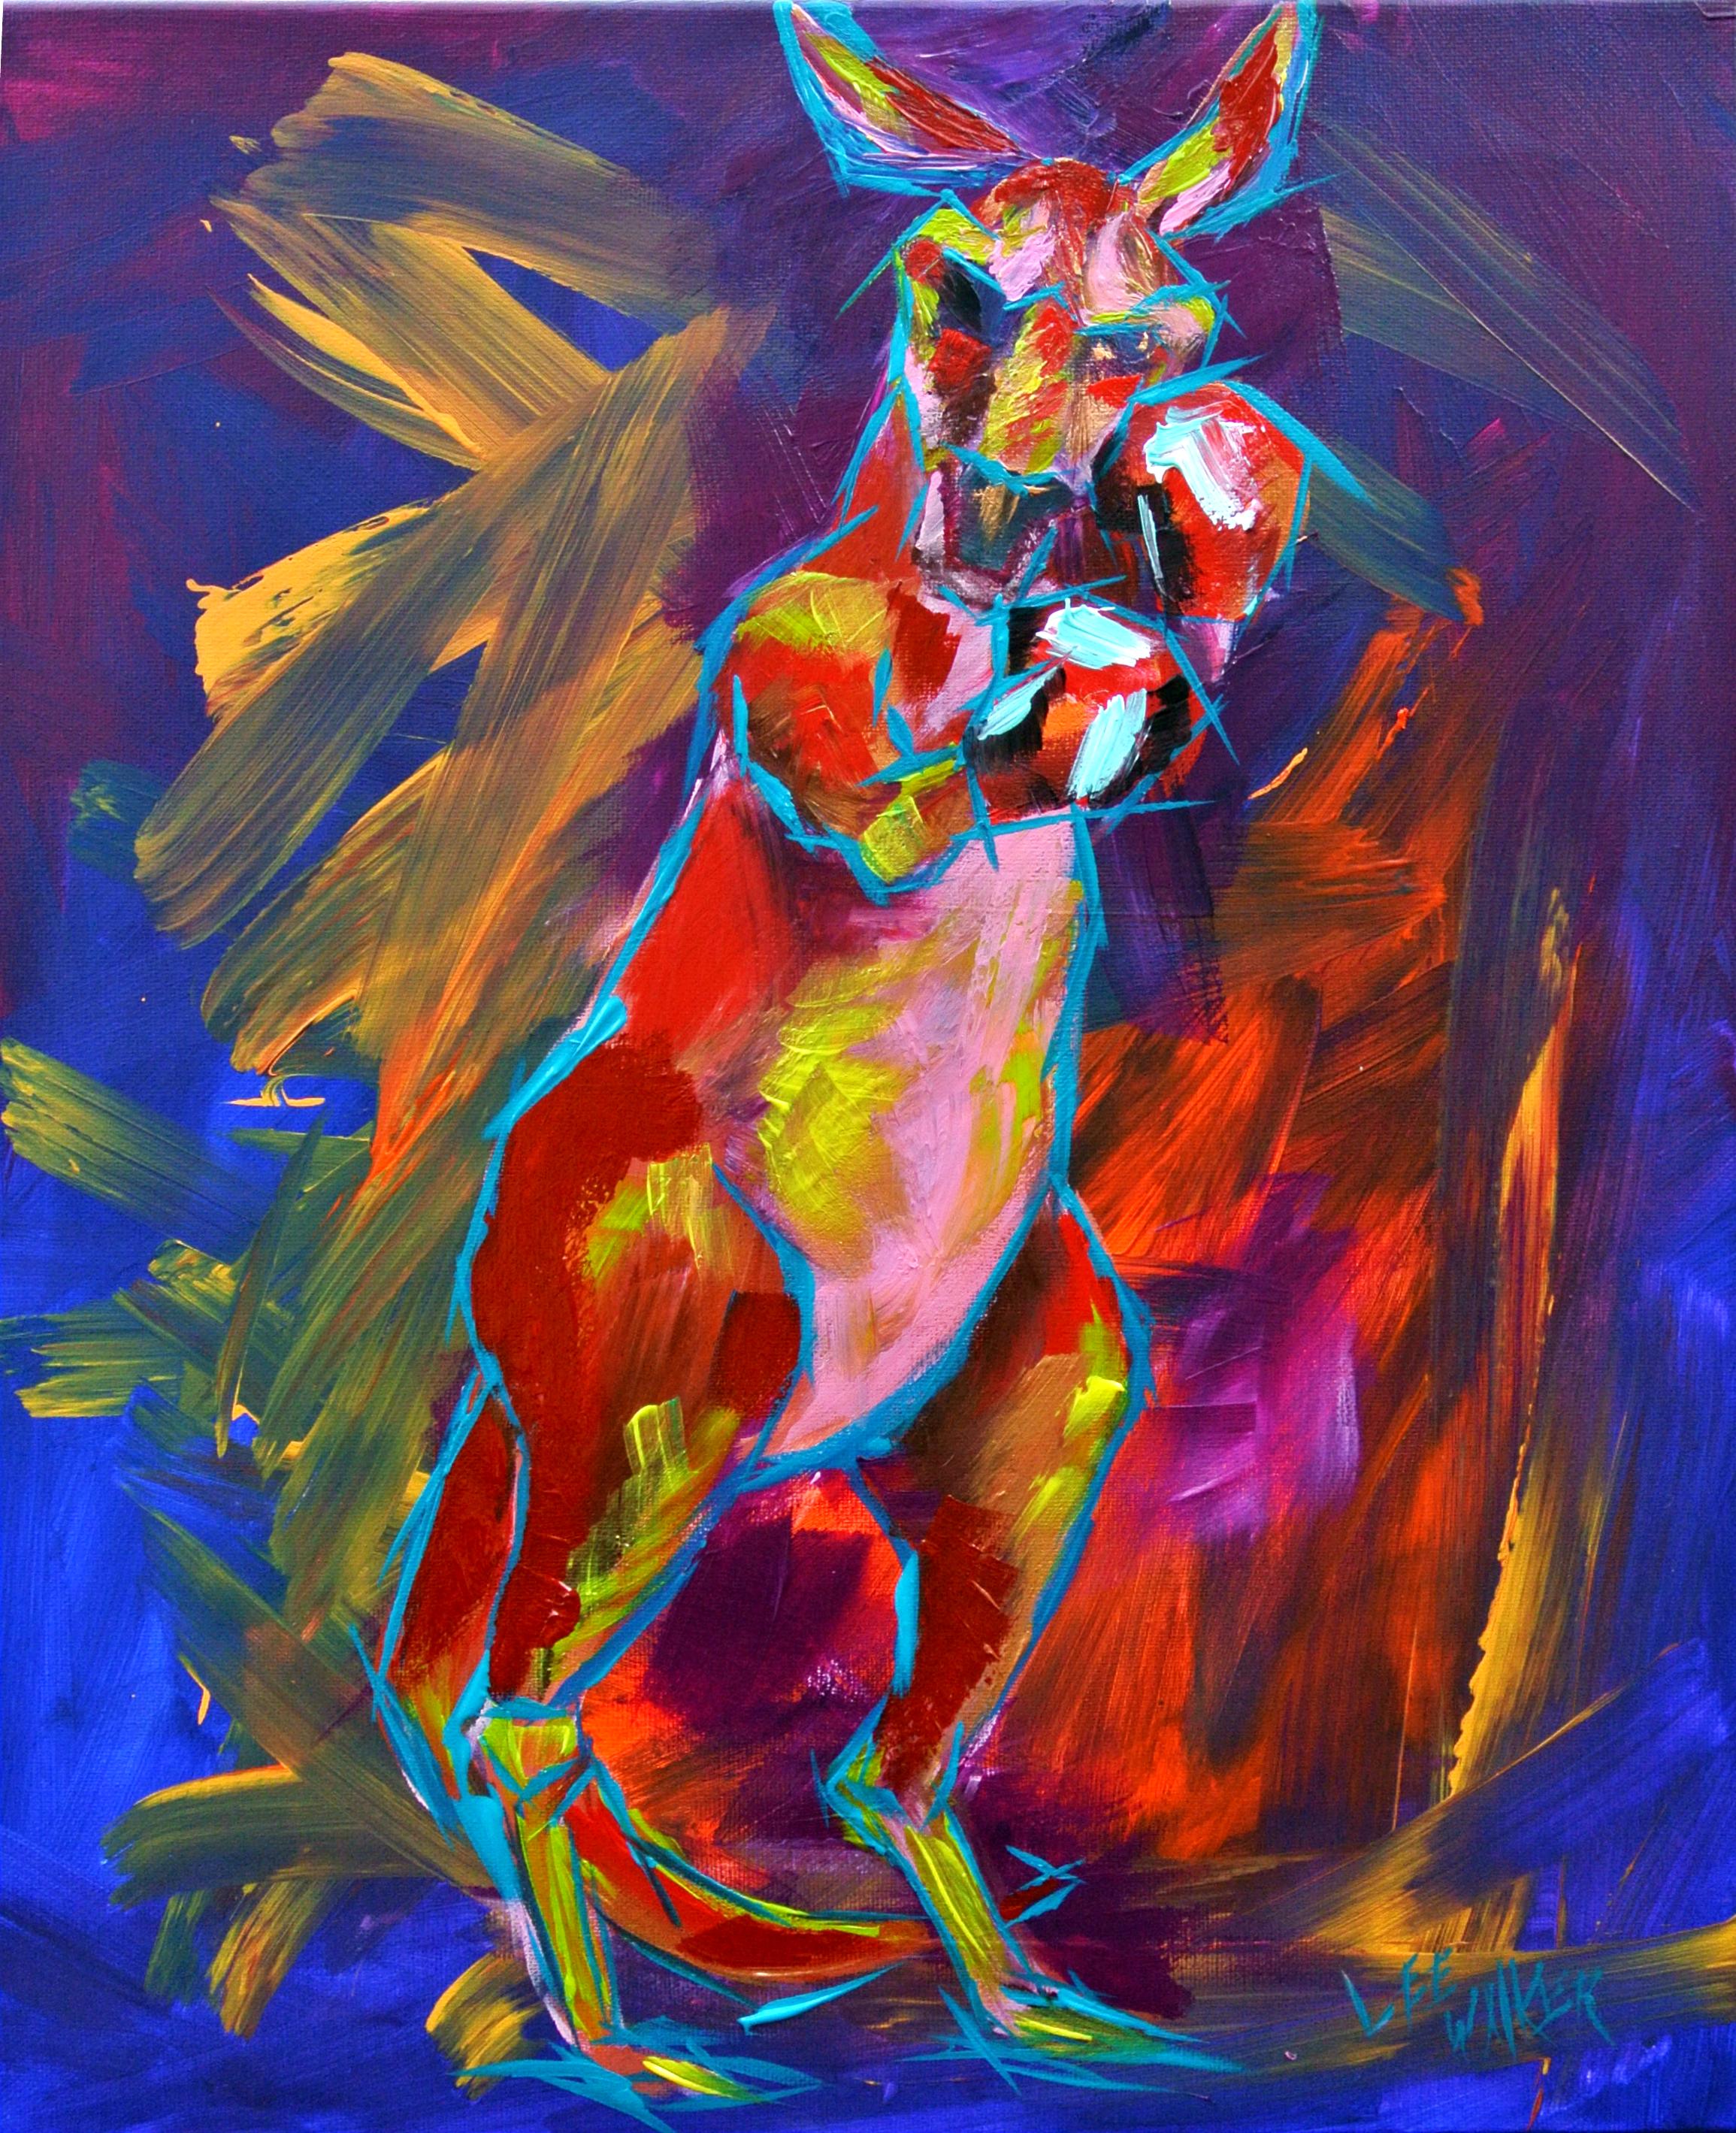 """Boxaroo"" 16x20"" acrylic on canvas     $200.00"